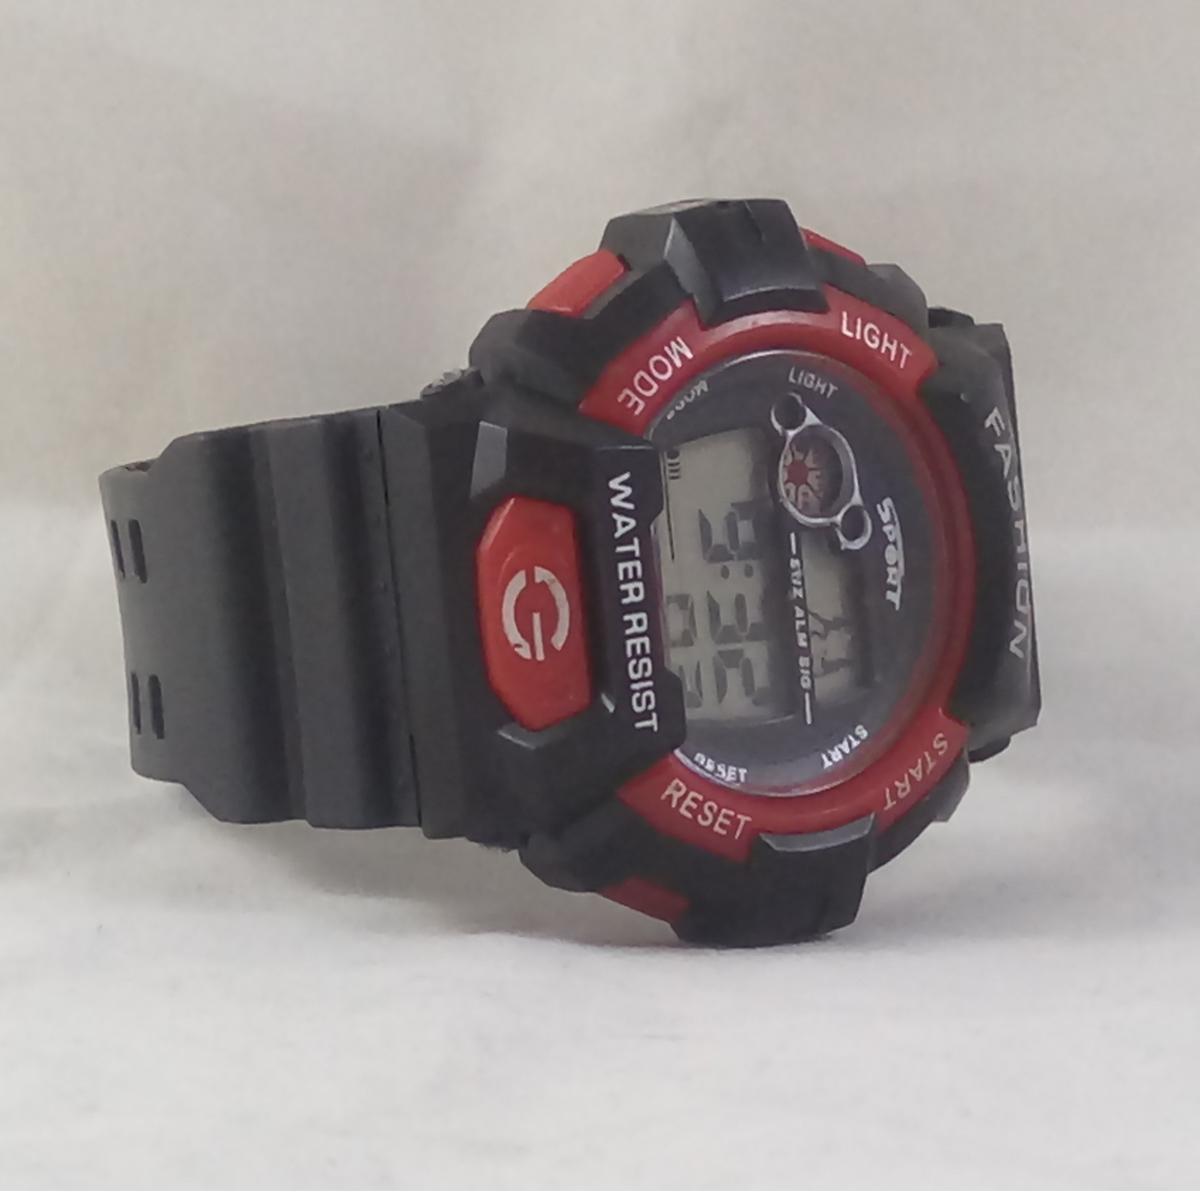 ساعت مچی دیجیتال مردانه مدل Od-Wt00006              اصل